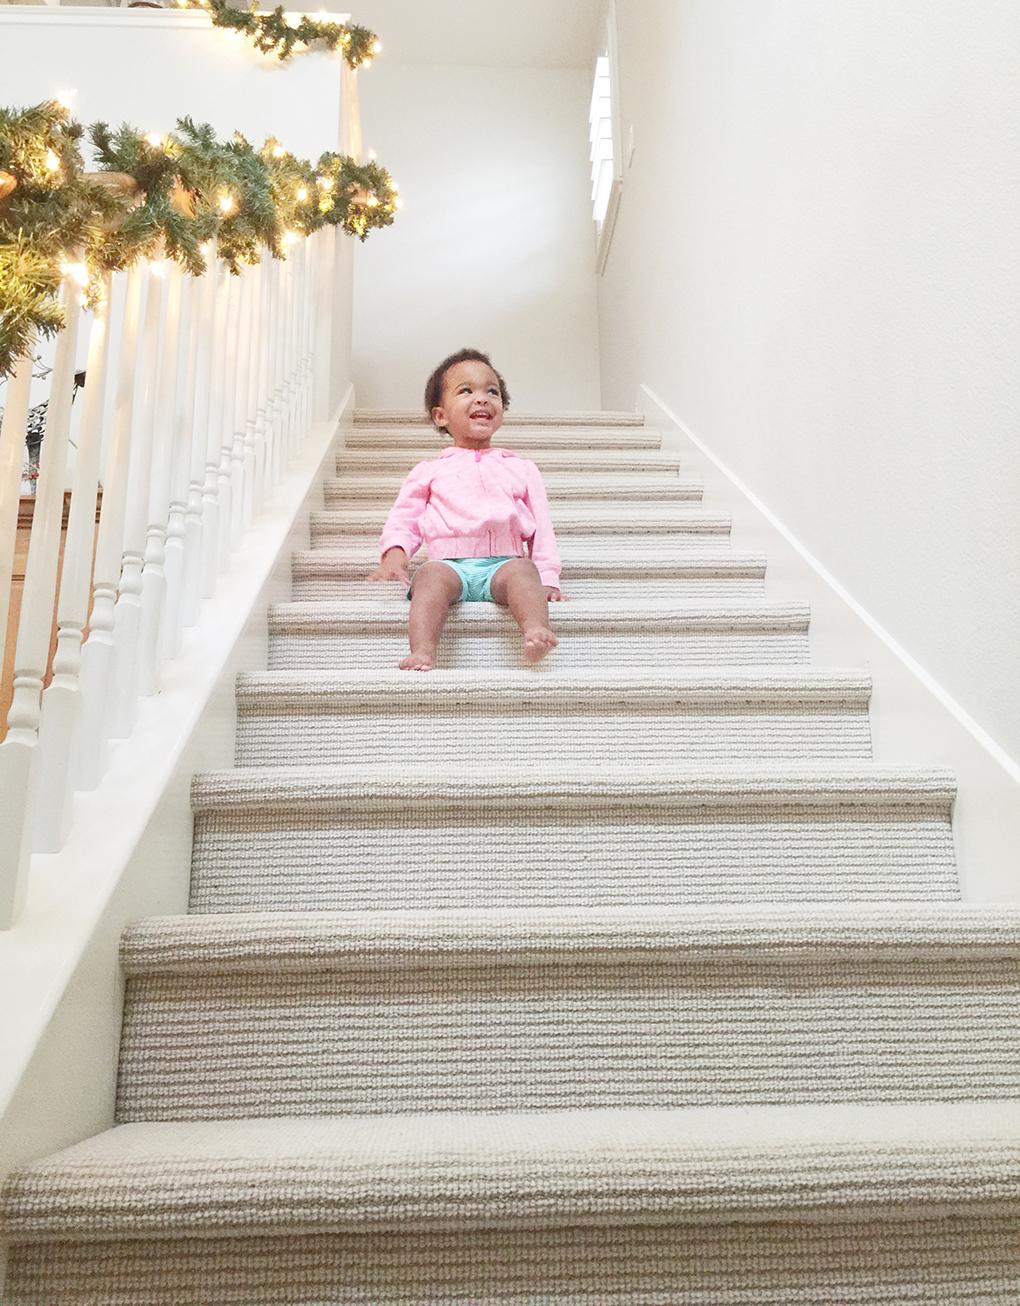 Christmas Eve Past, Present and Future_Samarah_2015 sarahkayhoffman.com